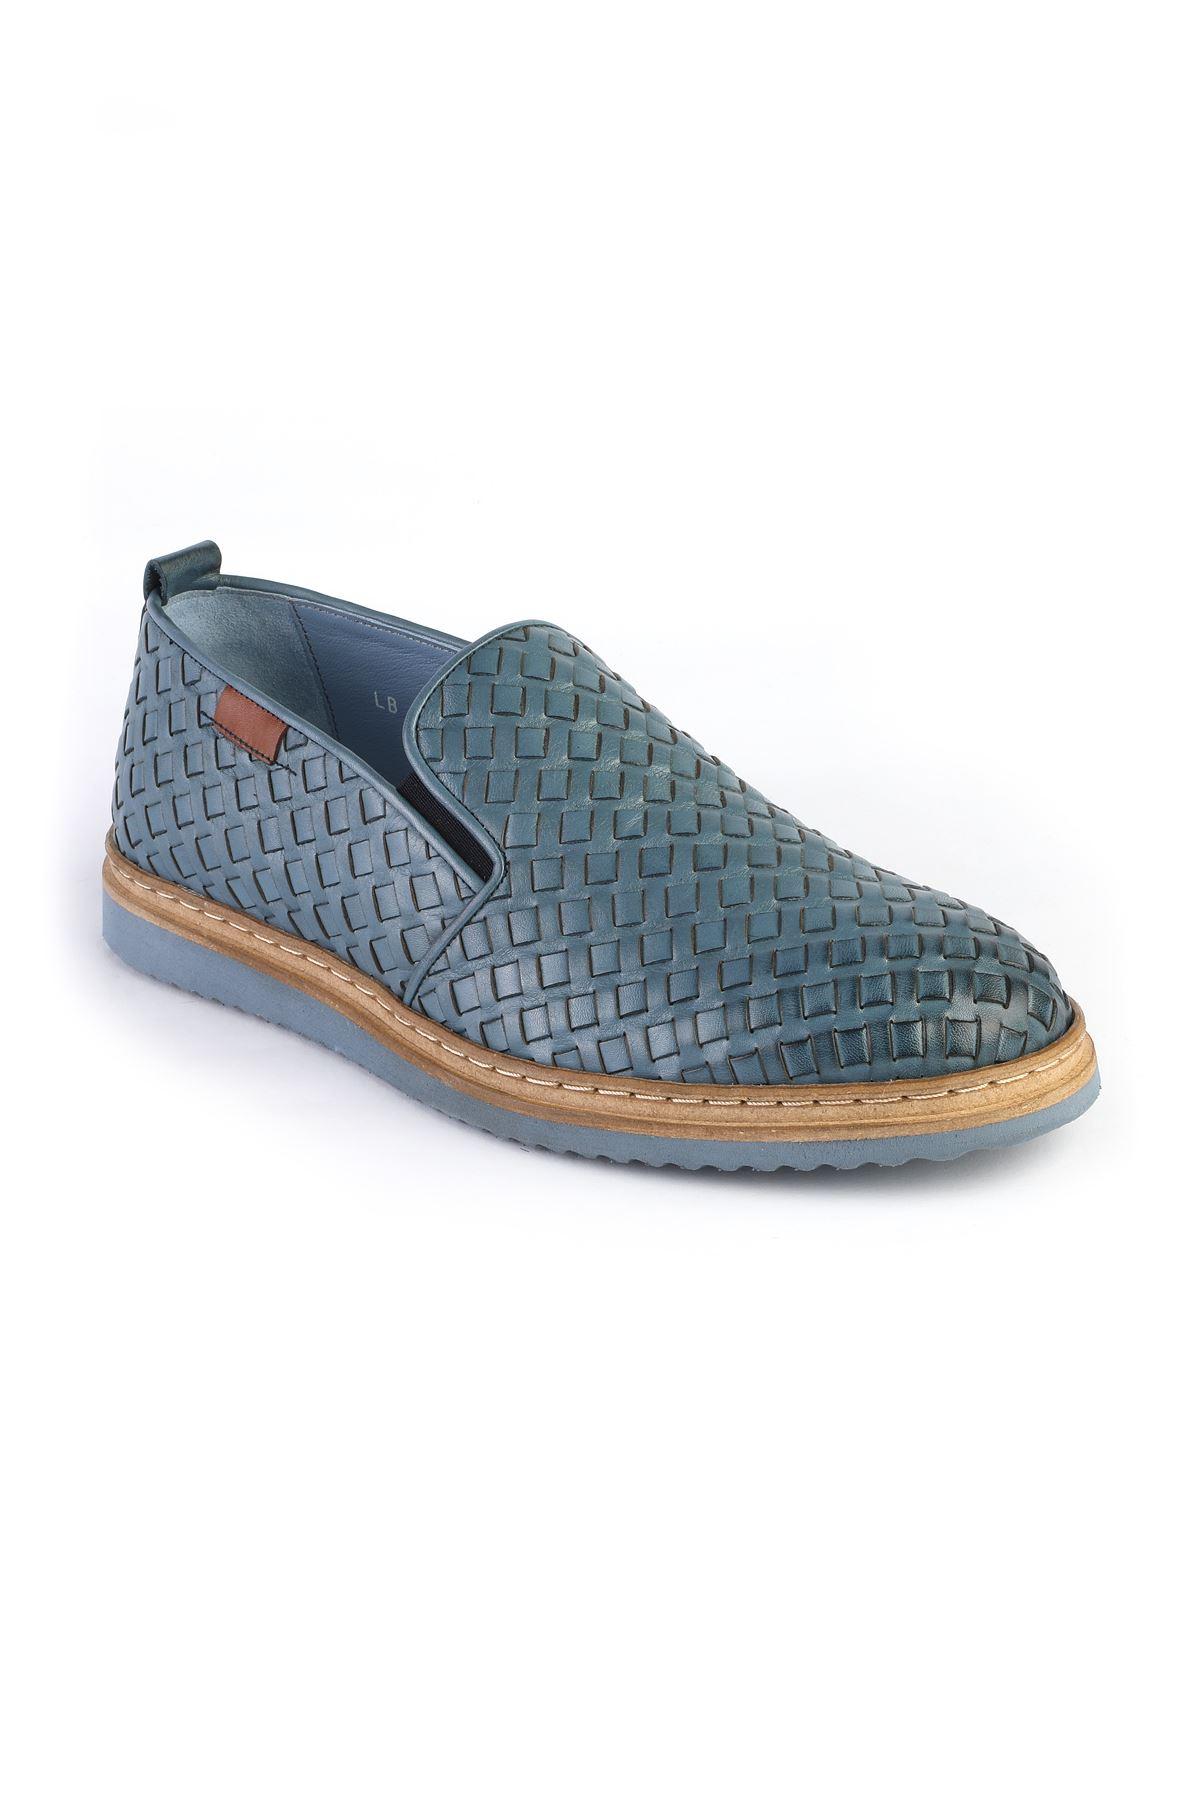 Libero 3295 Mavi Loafer Ayakkabı